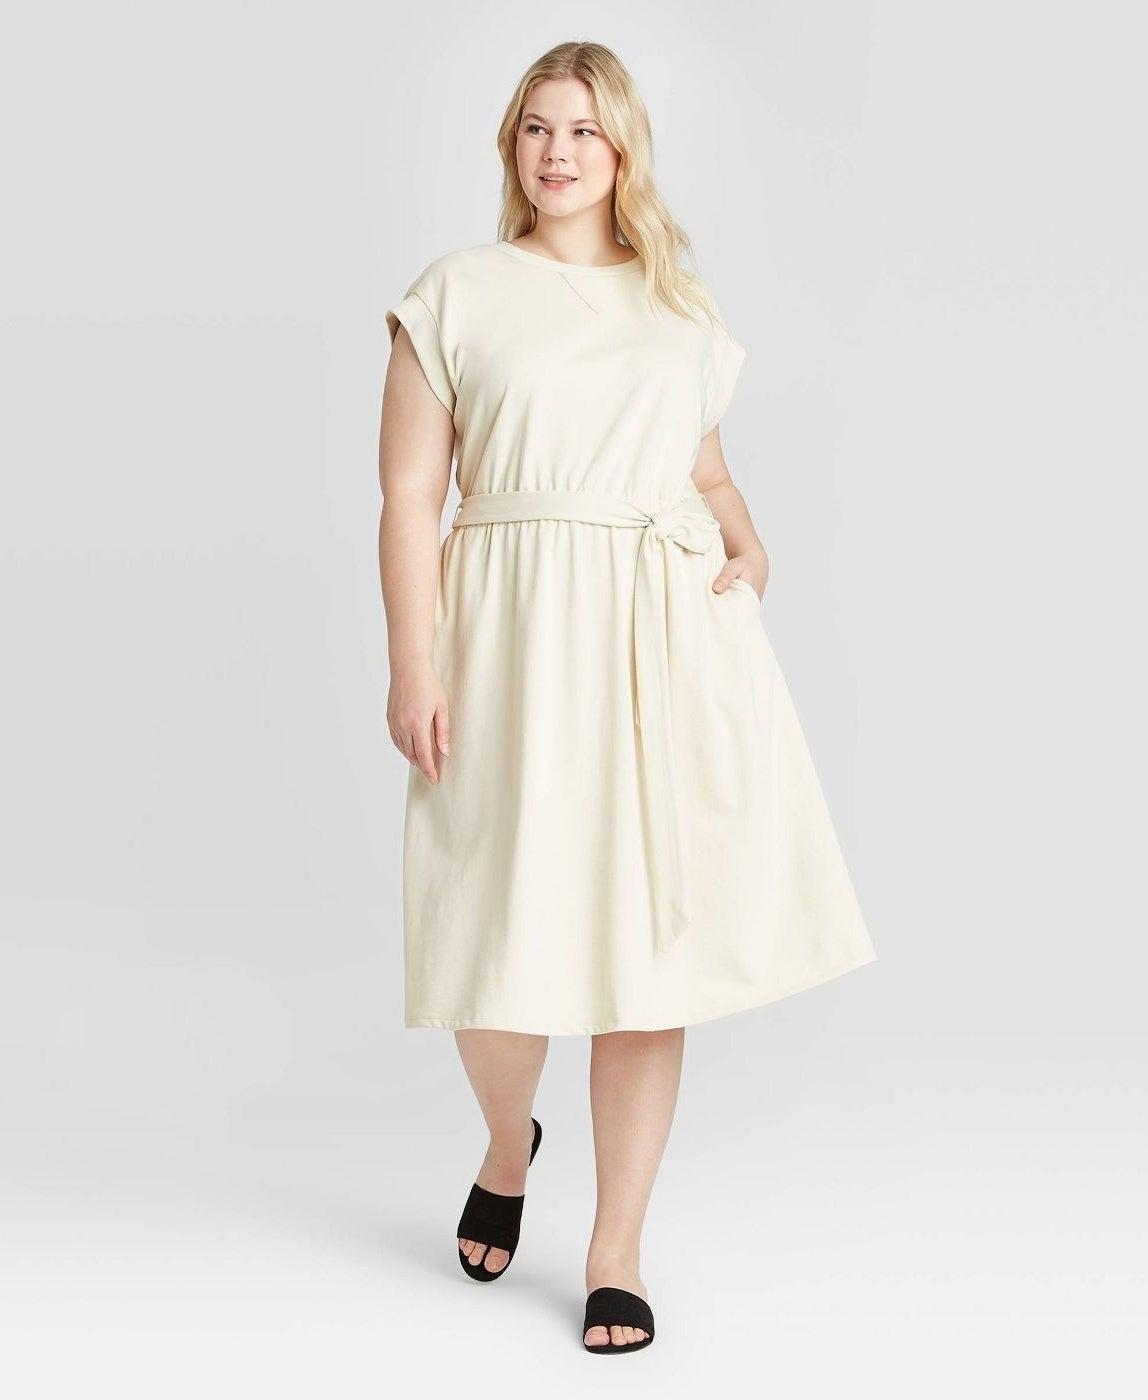 model wearing high-neck cream midi dress with tie waist